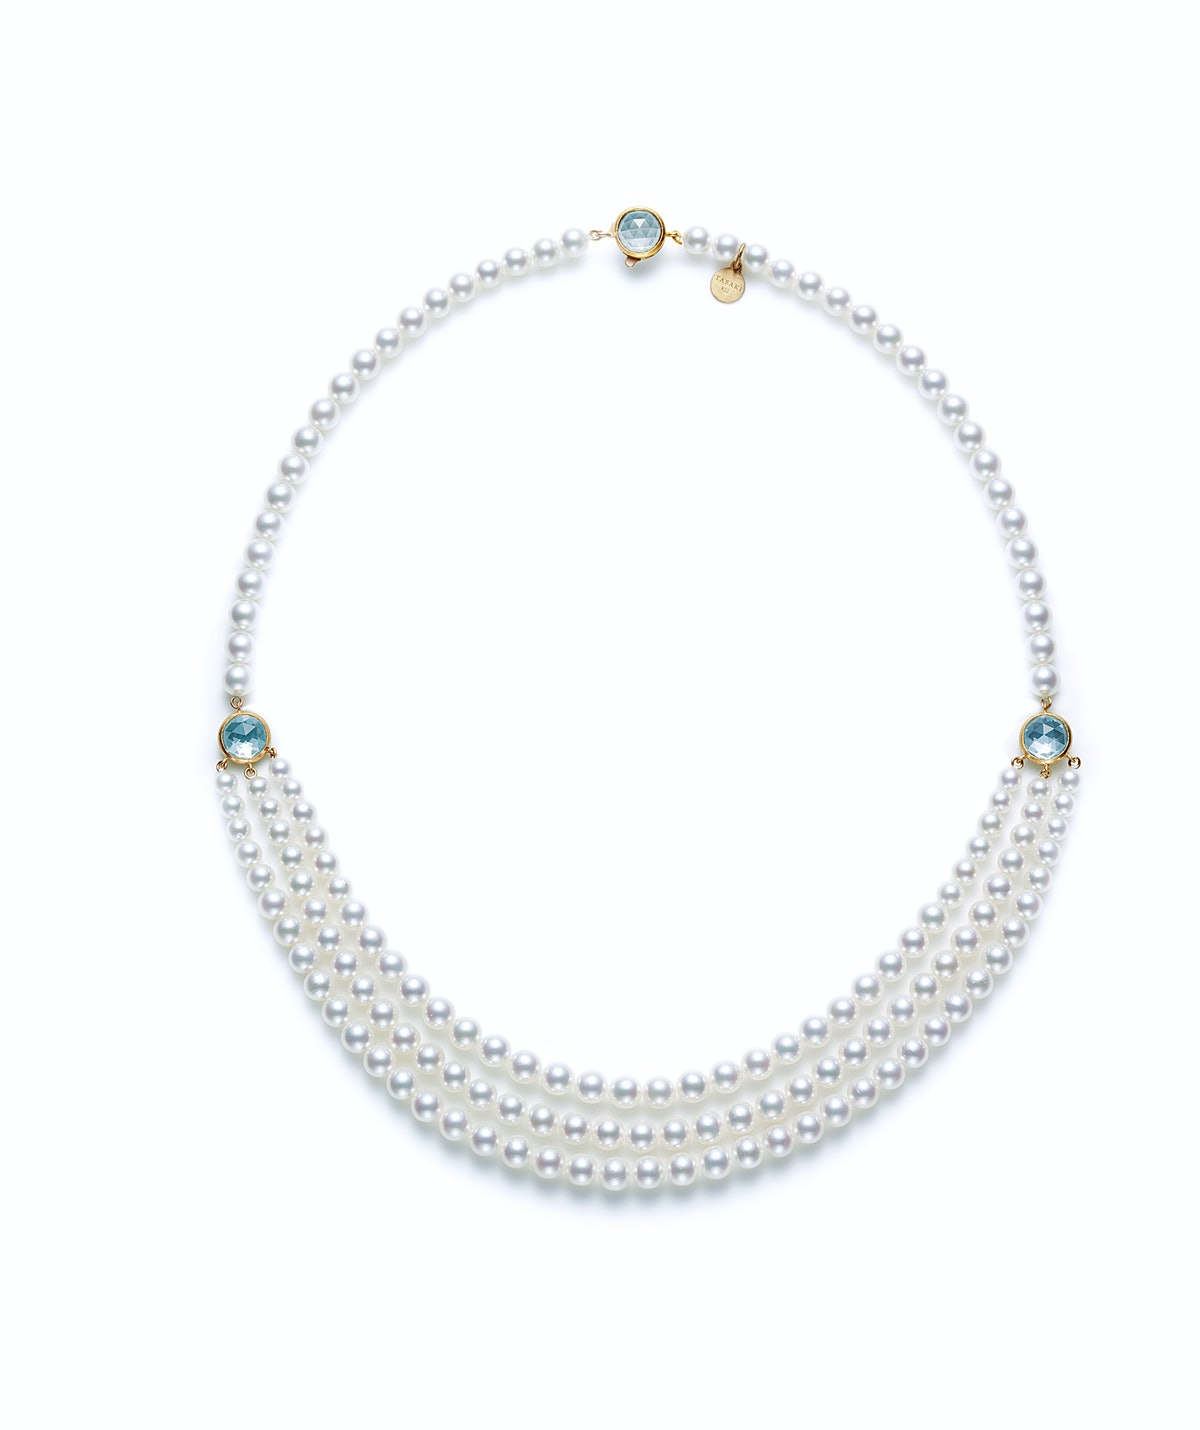 acss-marie-helene-de-talliac-pearls-01